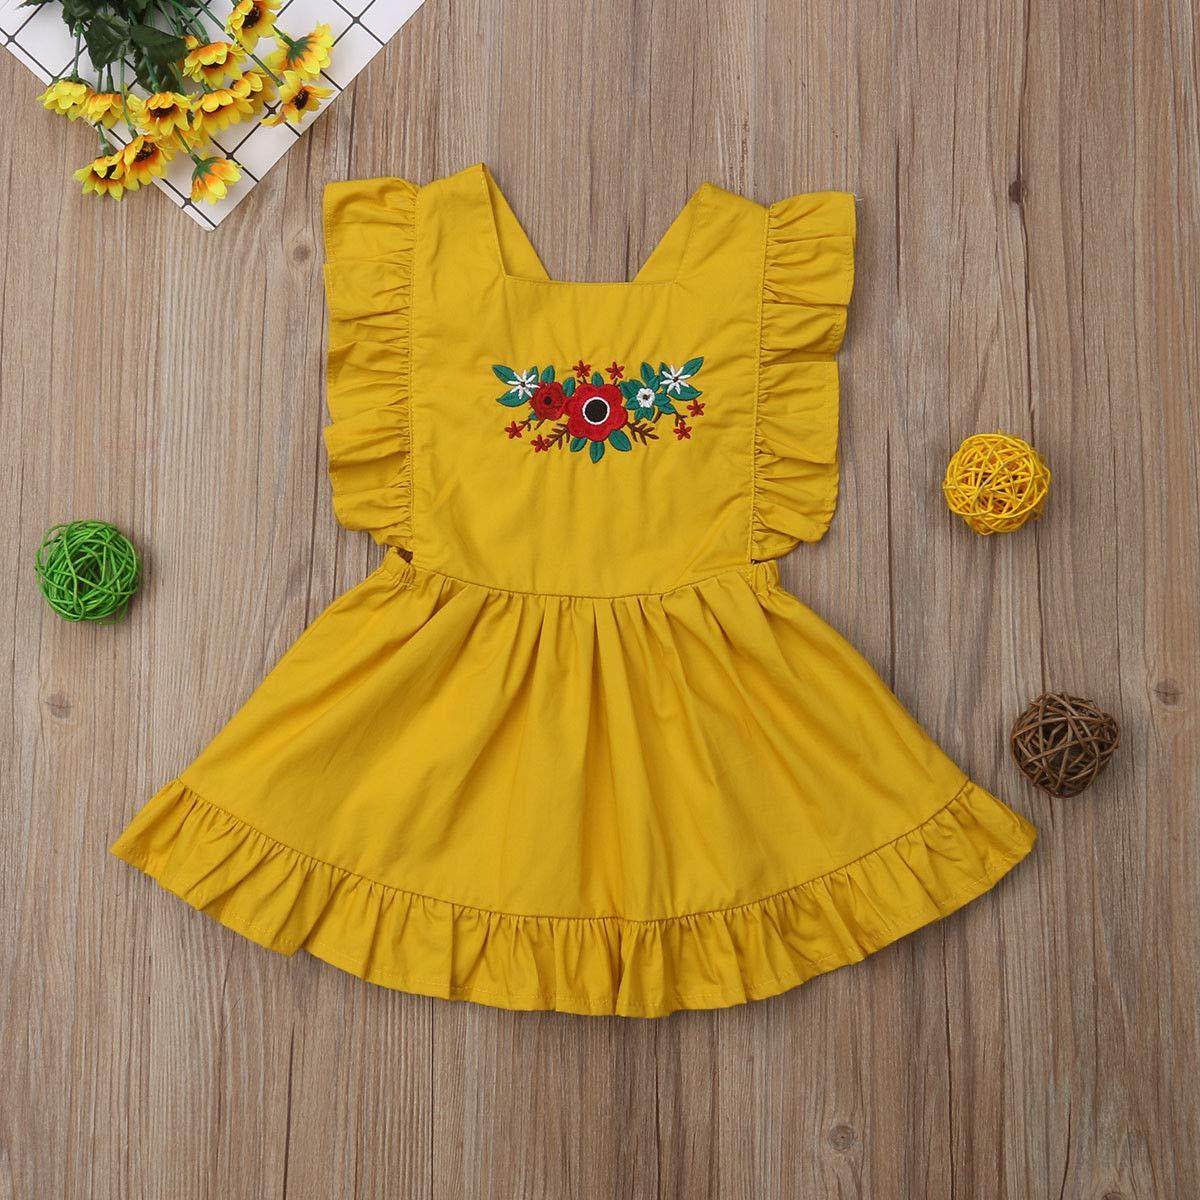 ZAXARRA Toddler Kids Baby Girls Sleeveless Ruffle Dress Tutu Skirt Overalls Outfits